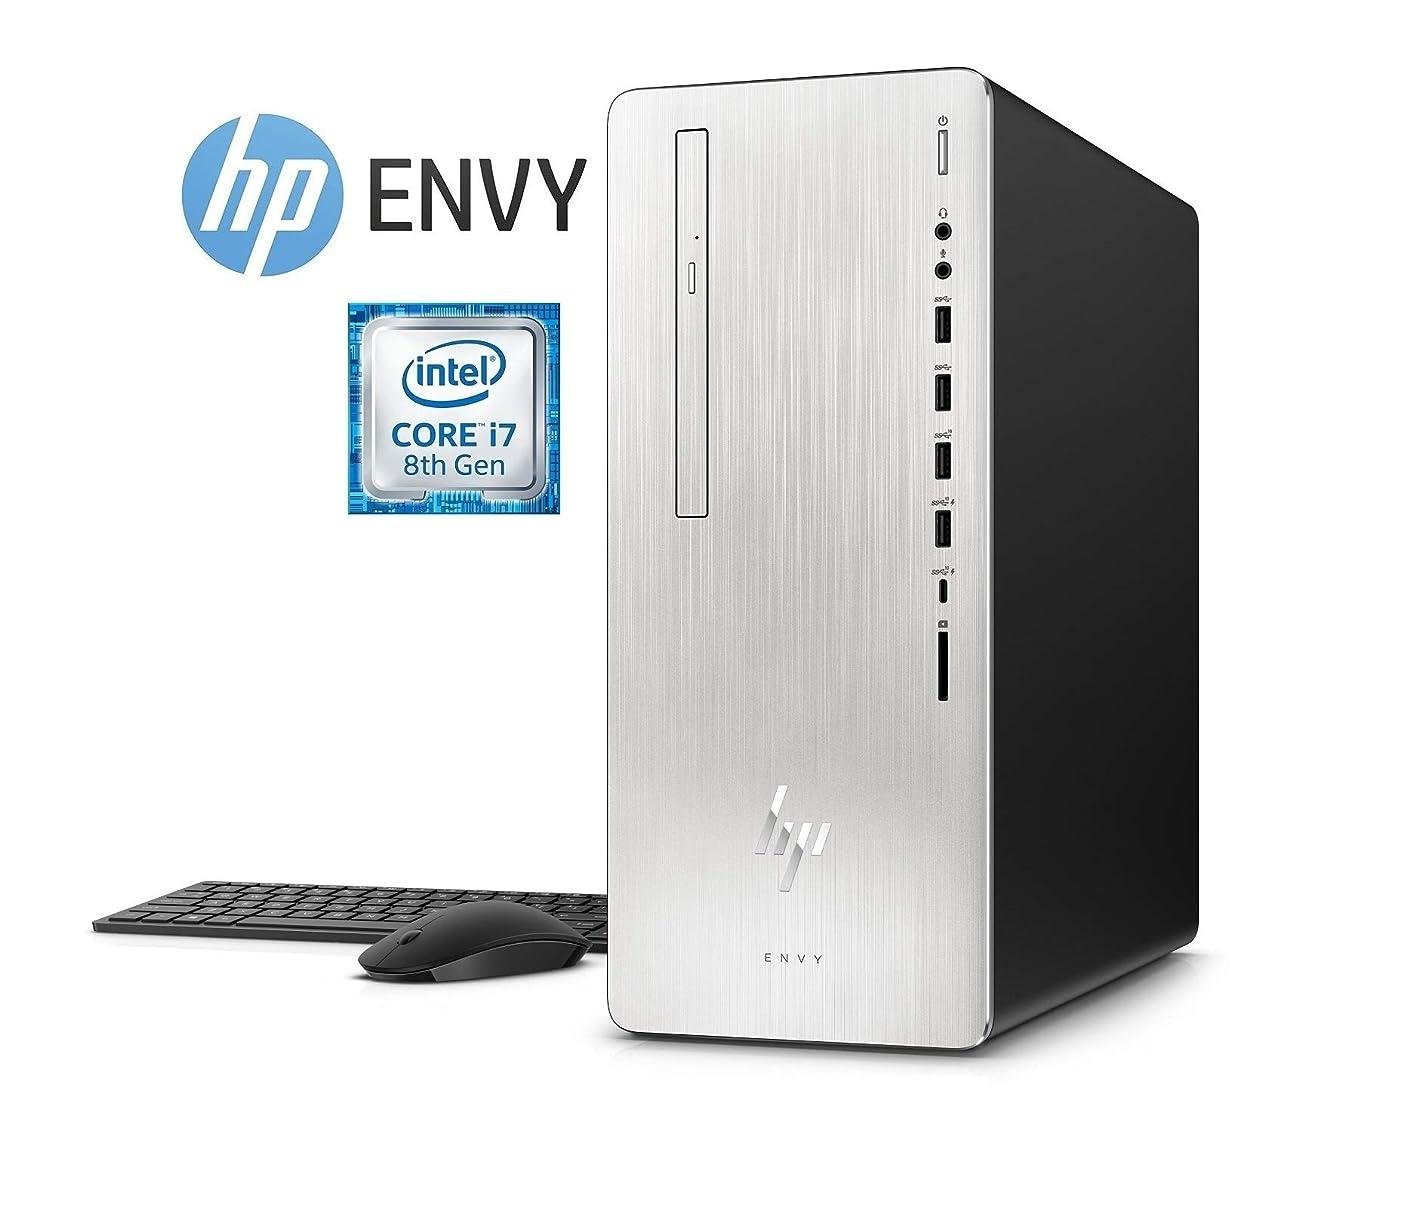 HP Envy 795 Intel Core i7-8700 1TB HDD + 256GB SSD 12GB RAM 4GB Radeon Graphics (Renewed)